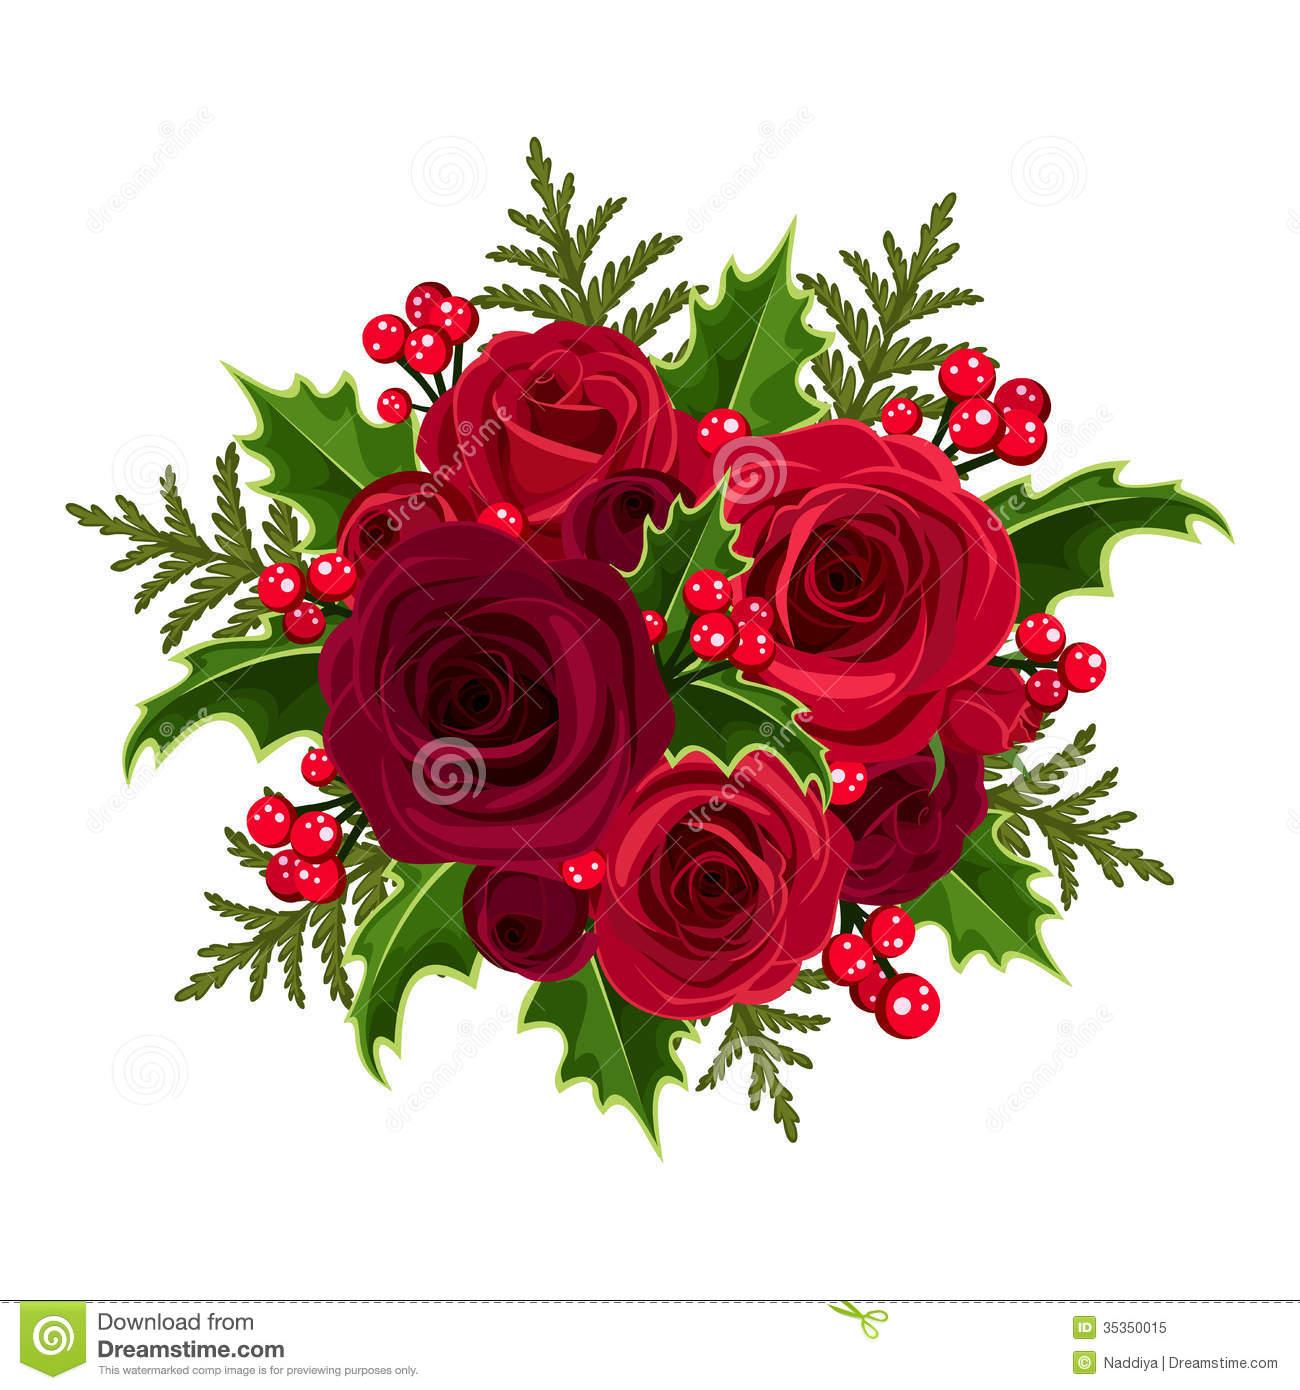 Christmas flower arrangements clipart.